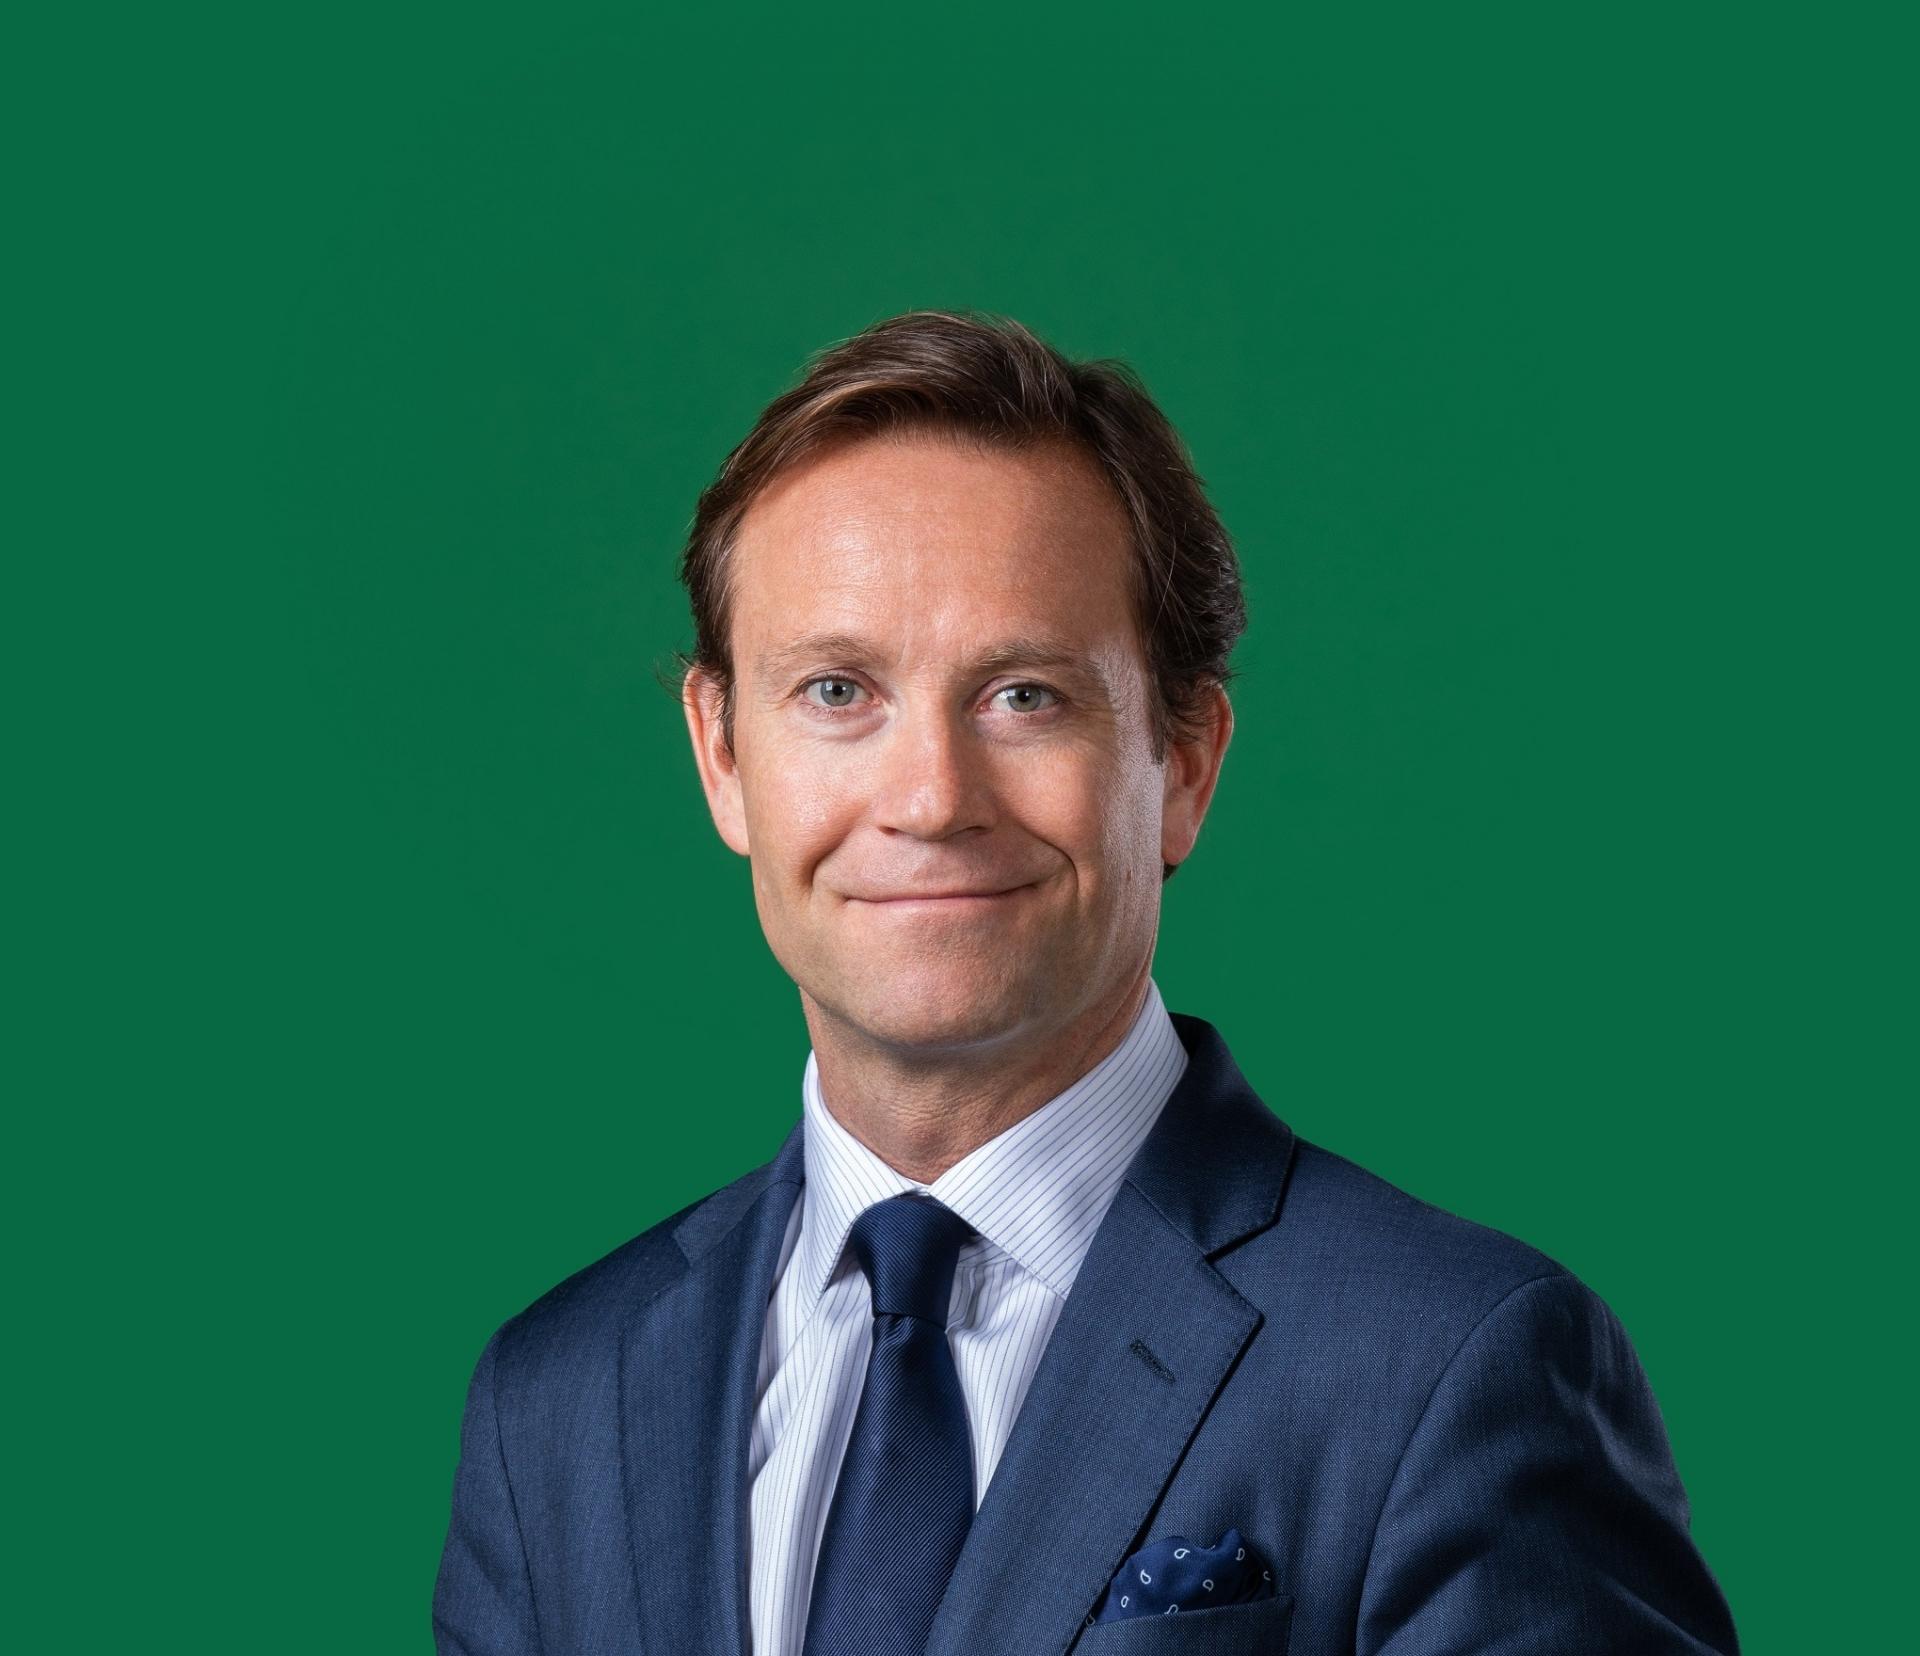 HEINEKEN appoints new regional president Asia-Pacific and managing director in Vietnam